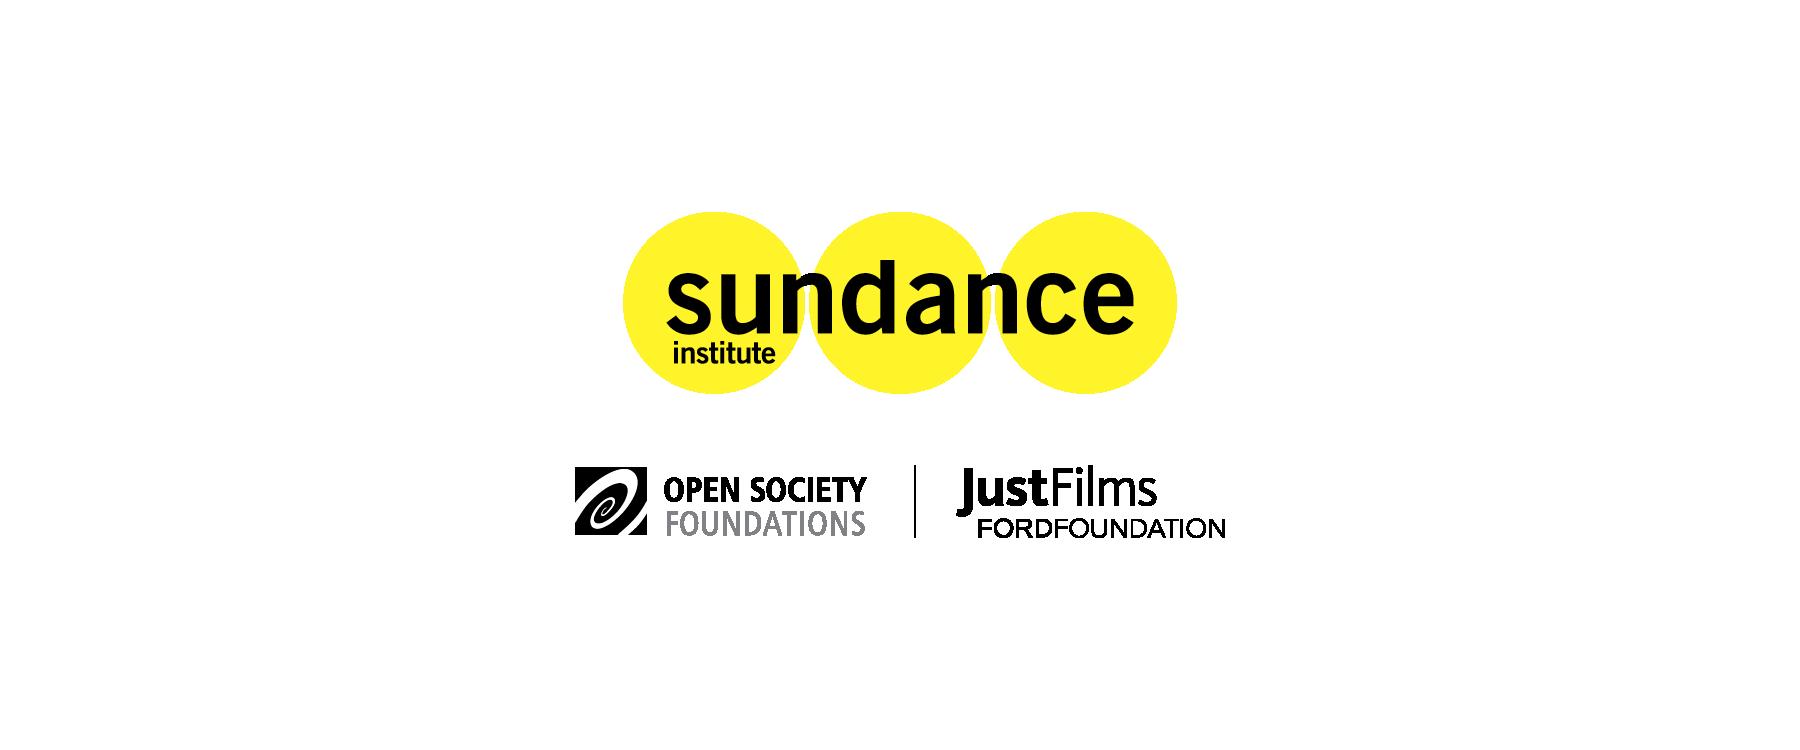 SI17_DFP_lockups_Justfilms_osf_logos.png